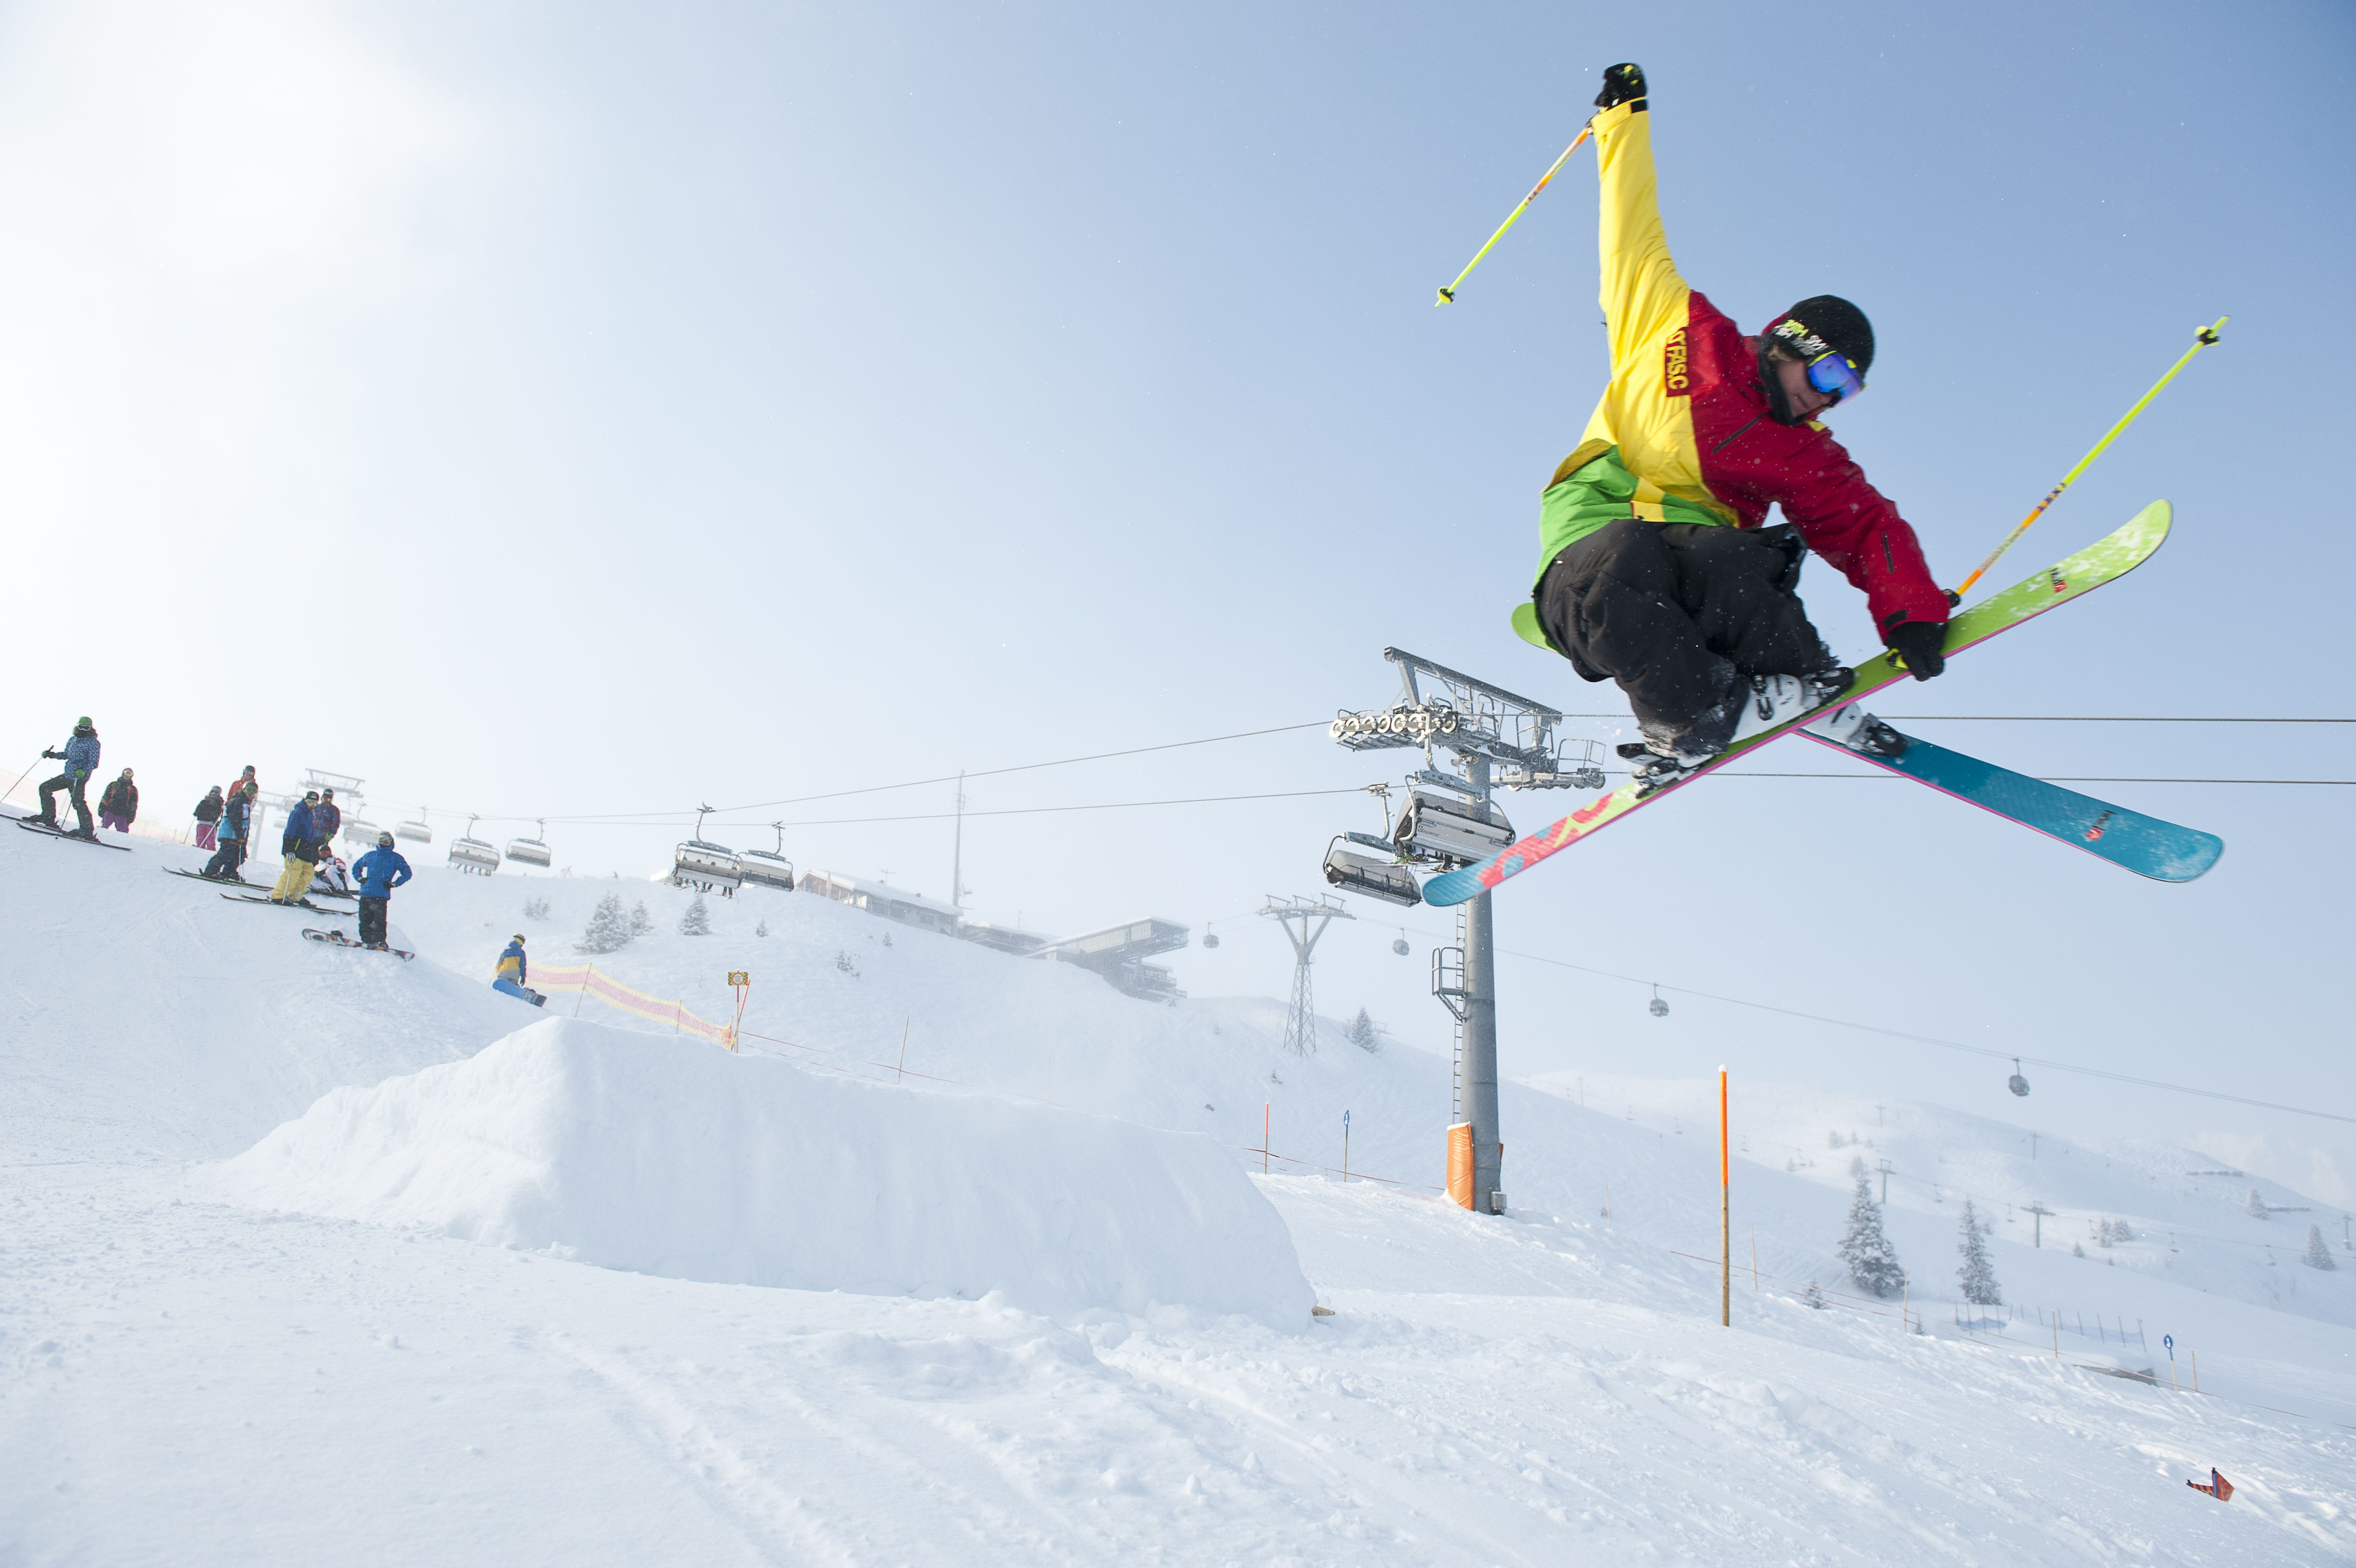 freestyle skiing at Golm in Montafon Schi fahren am Golm